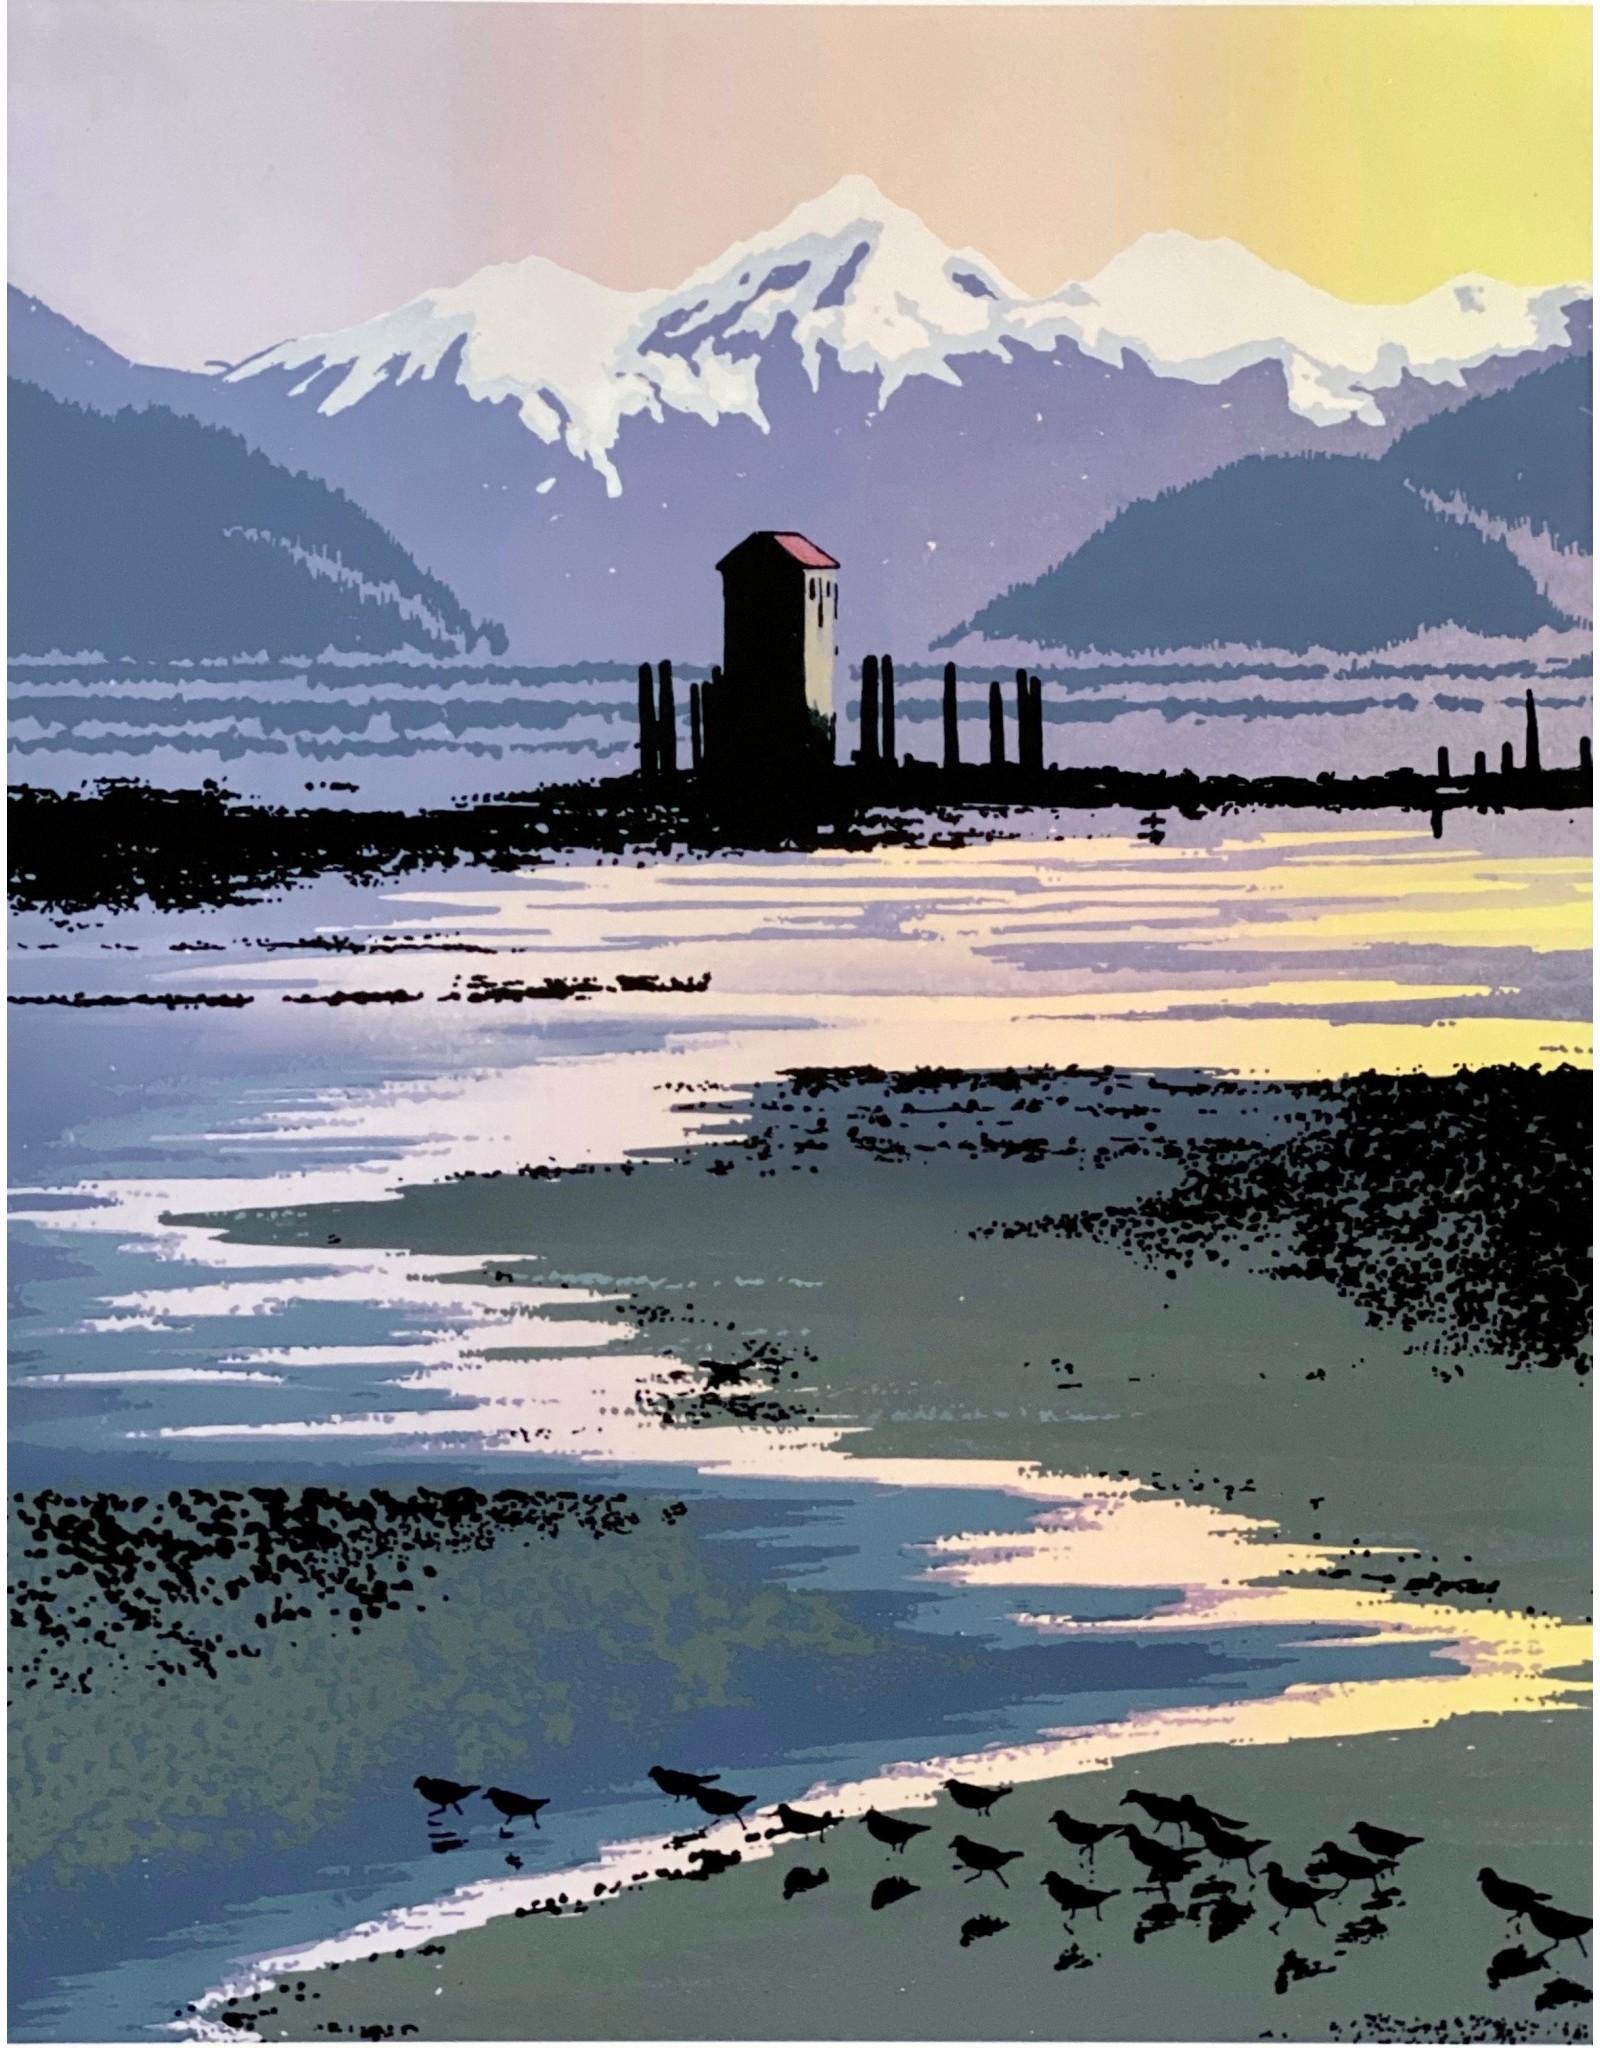 Alice Tersteeg Treadwell Saltwater Pumphouse (art card)    Alice Tersteeg